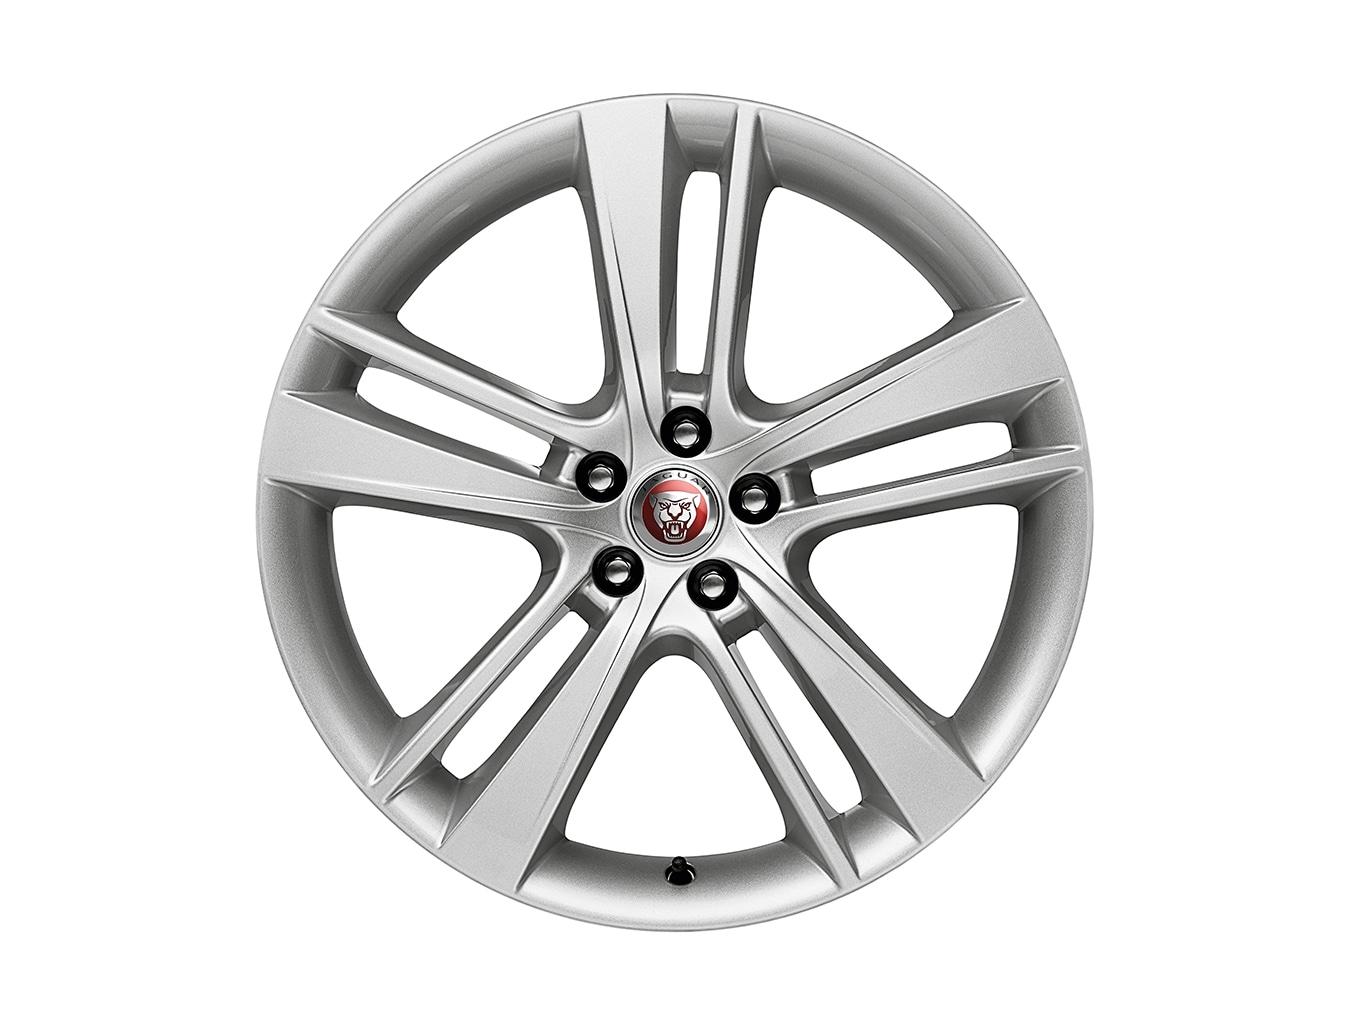 Jaguar Accessories F Type Wheels Amp Wheel Accessories